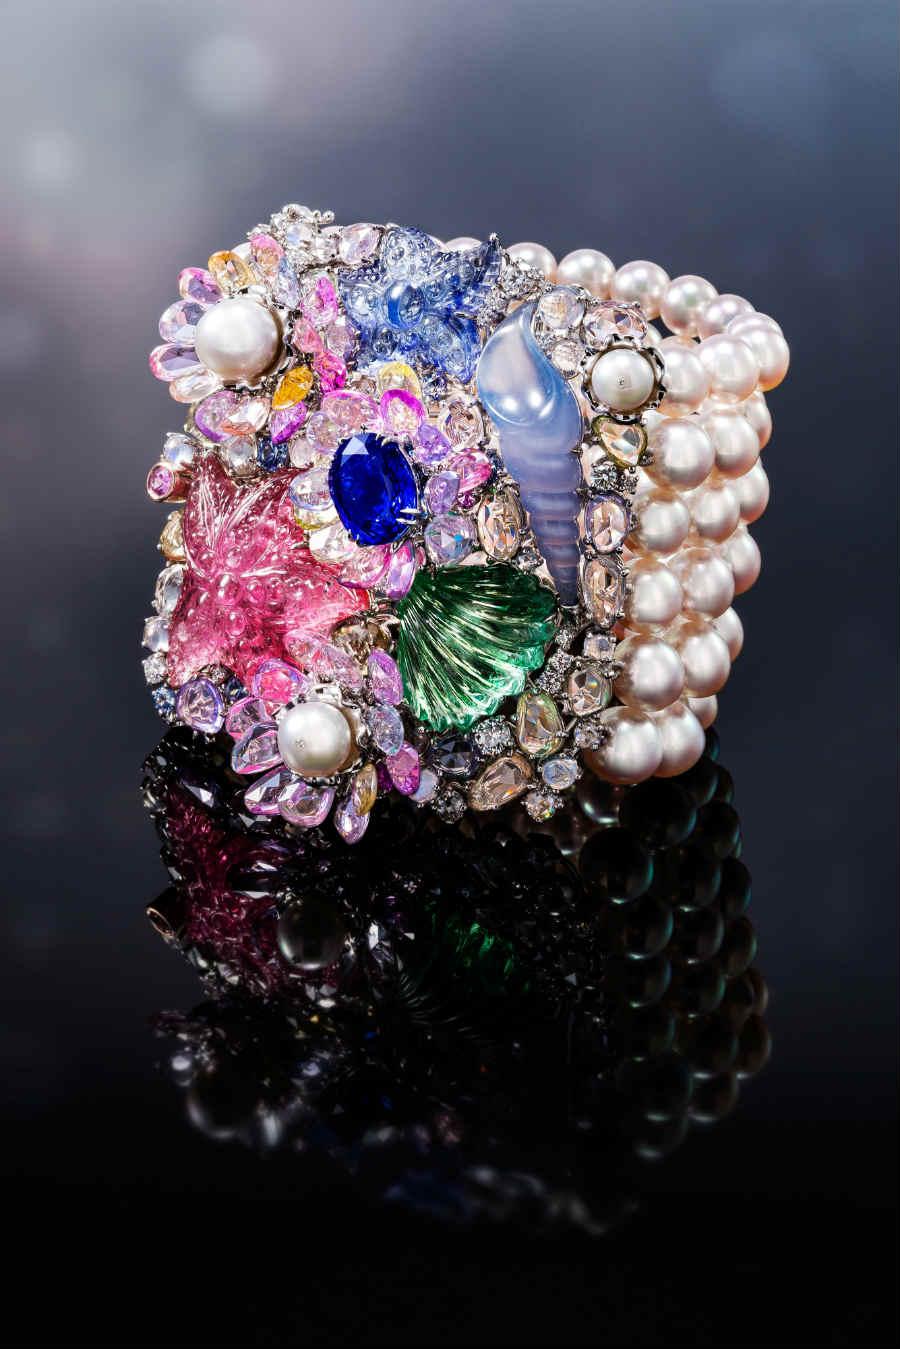 Anna Hu - Siren Aria - Bracciale con zaffiro (4.65 cts), rubellite (23.20 cts), tanzanite (9.26 cts), tormalina verde (16.27 cts), calcedonio (15.54 cts), 3 perle Akoya (circa 9 cts), pietre di luna, zaffiri colorati (39.95 cts), zaffiri blu, zaffiri rosa, diamanti taglio a rosa, brillanti , 84 perle Akoya (7.5 – 8 mm).